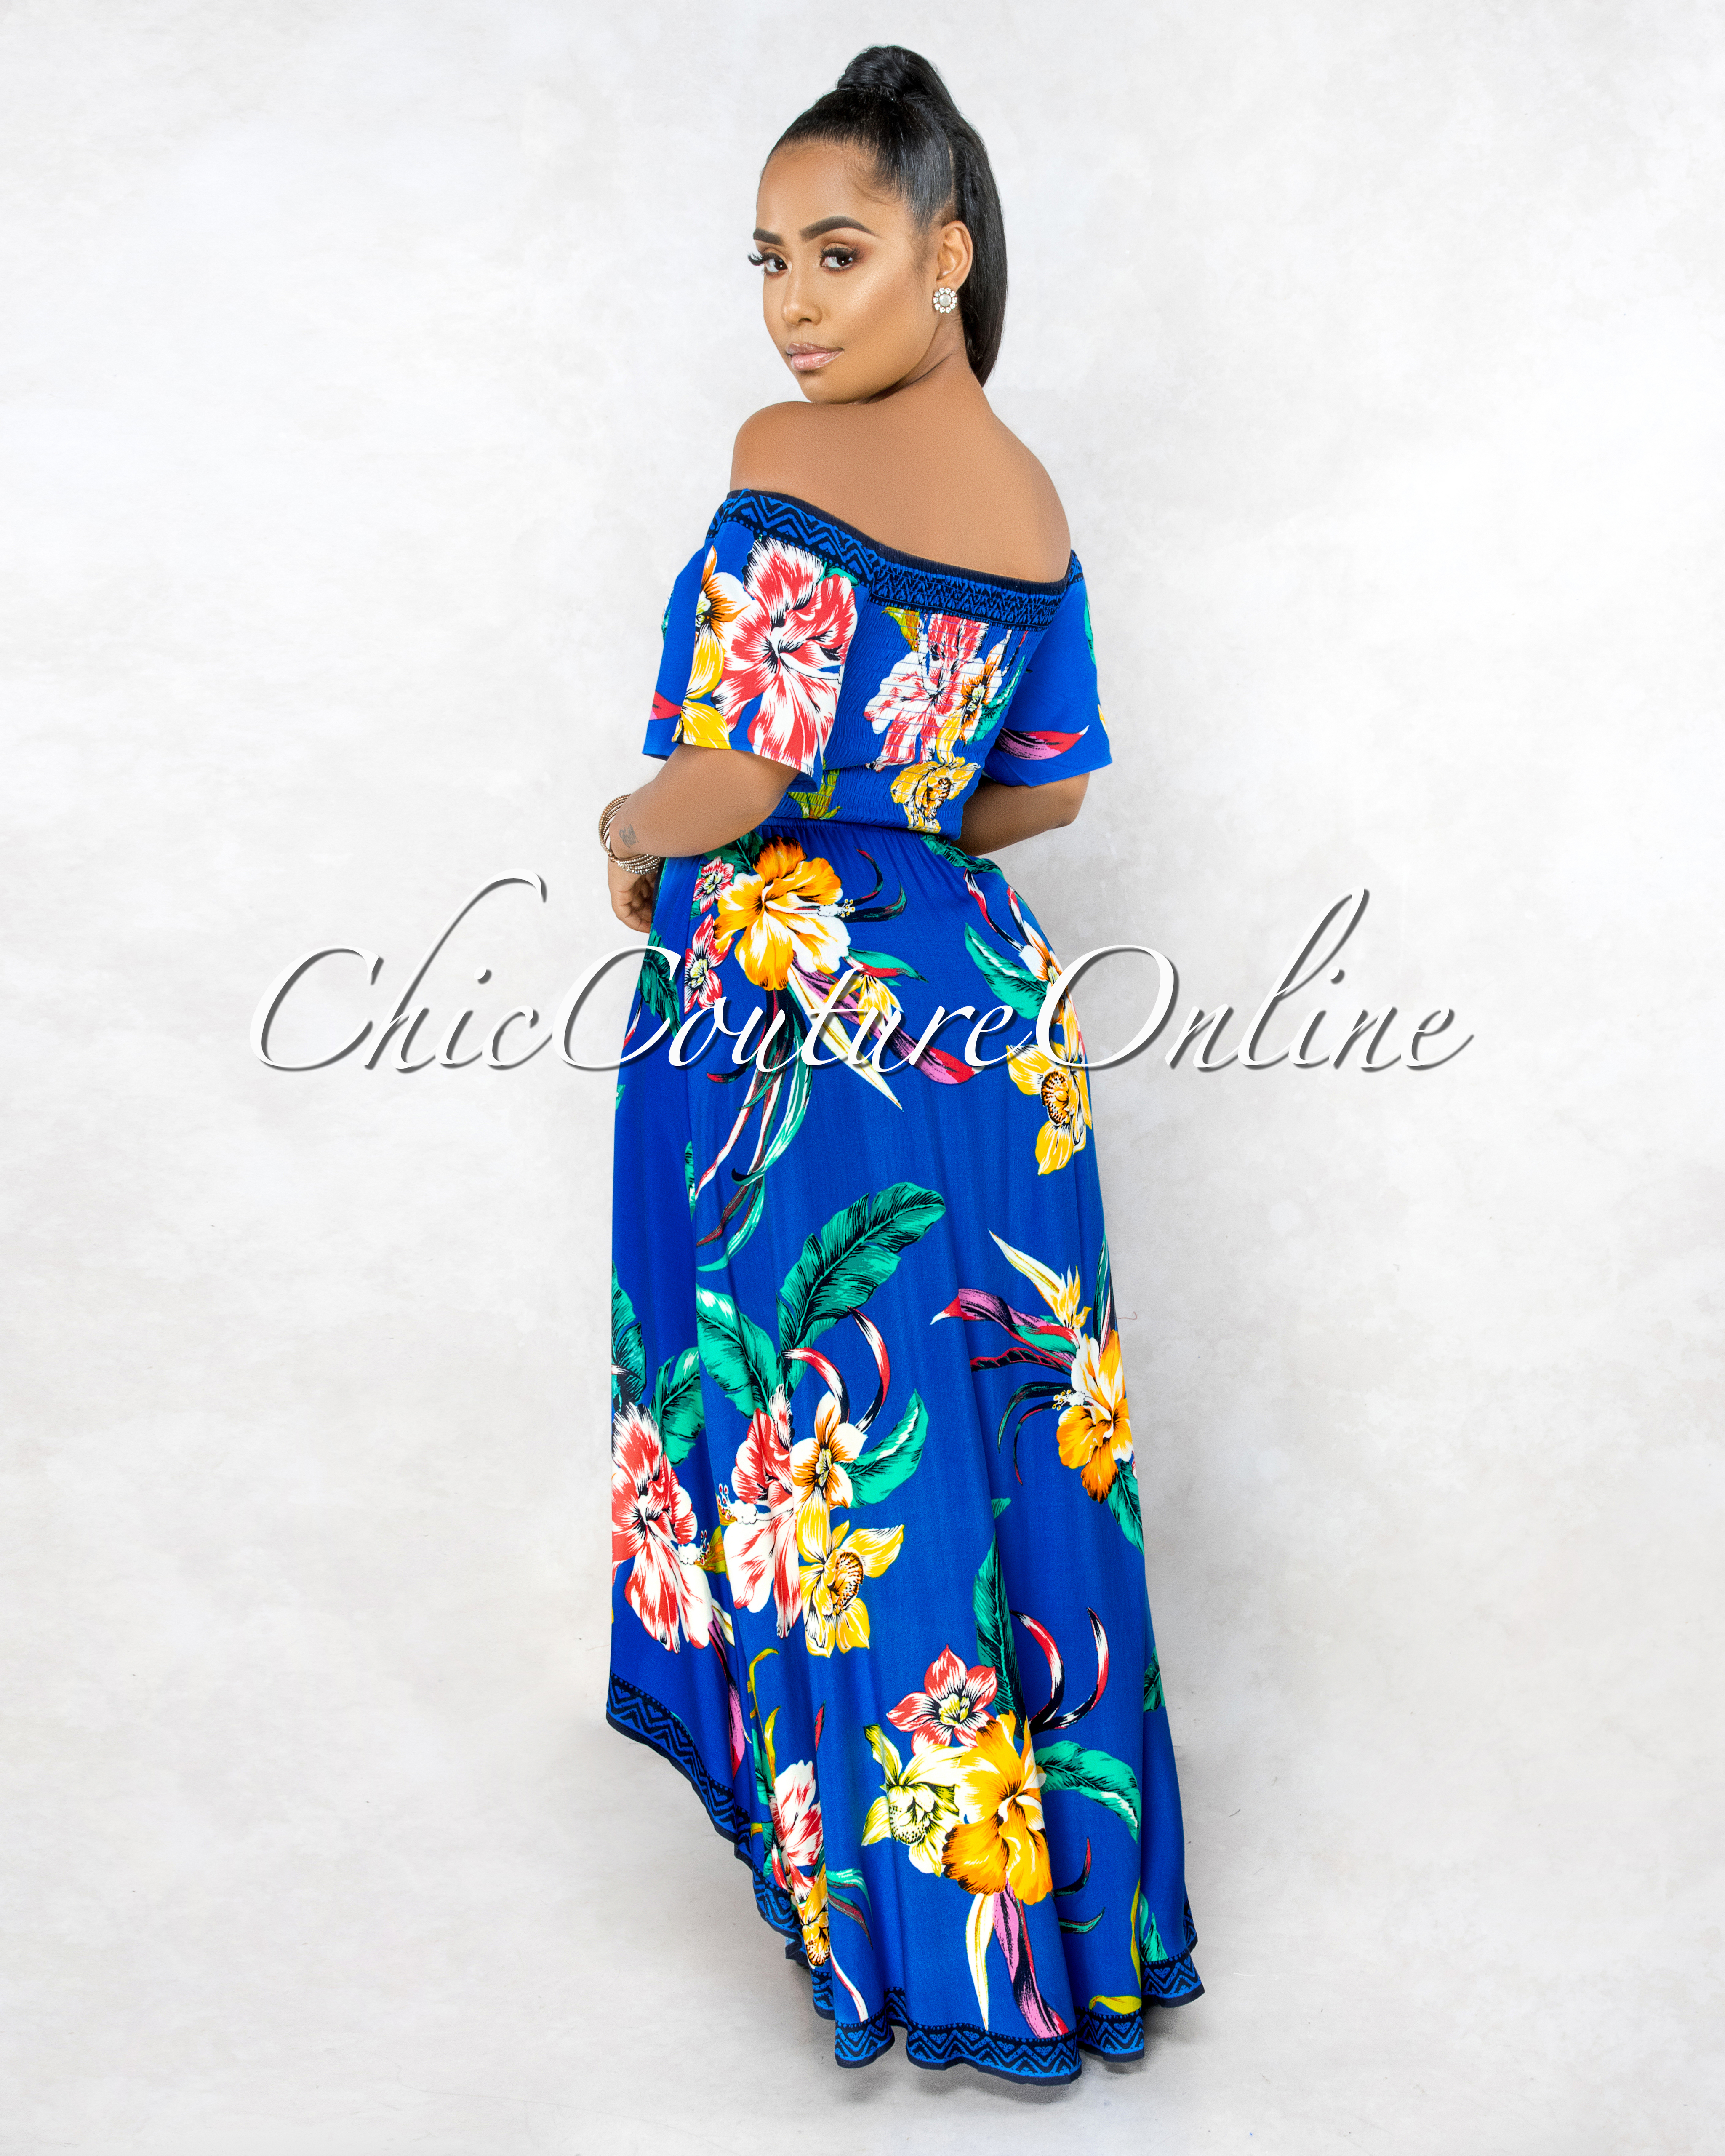 Yalena Royal Blue Floral Smocked Top High-Low Maxi Dress